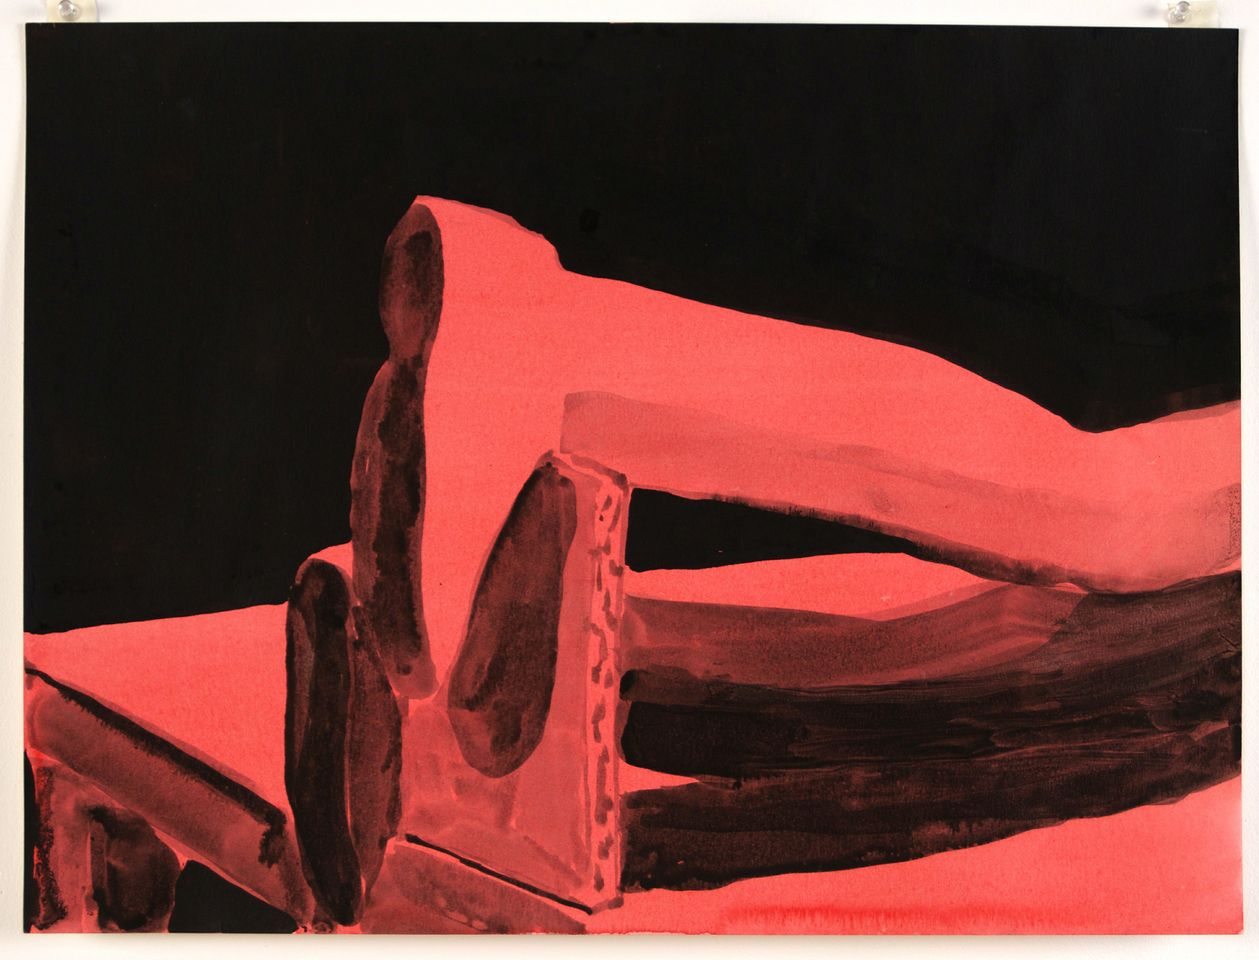 Broken Ankles (Red), 2014